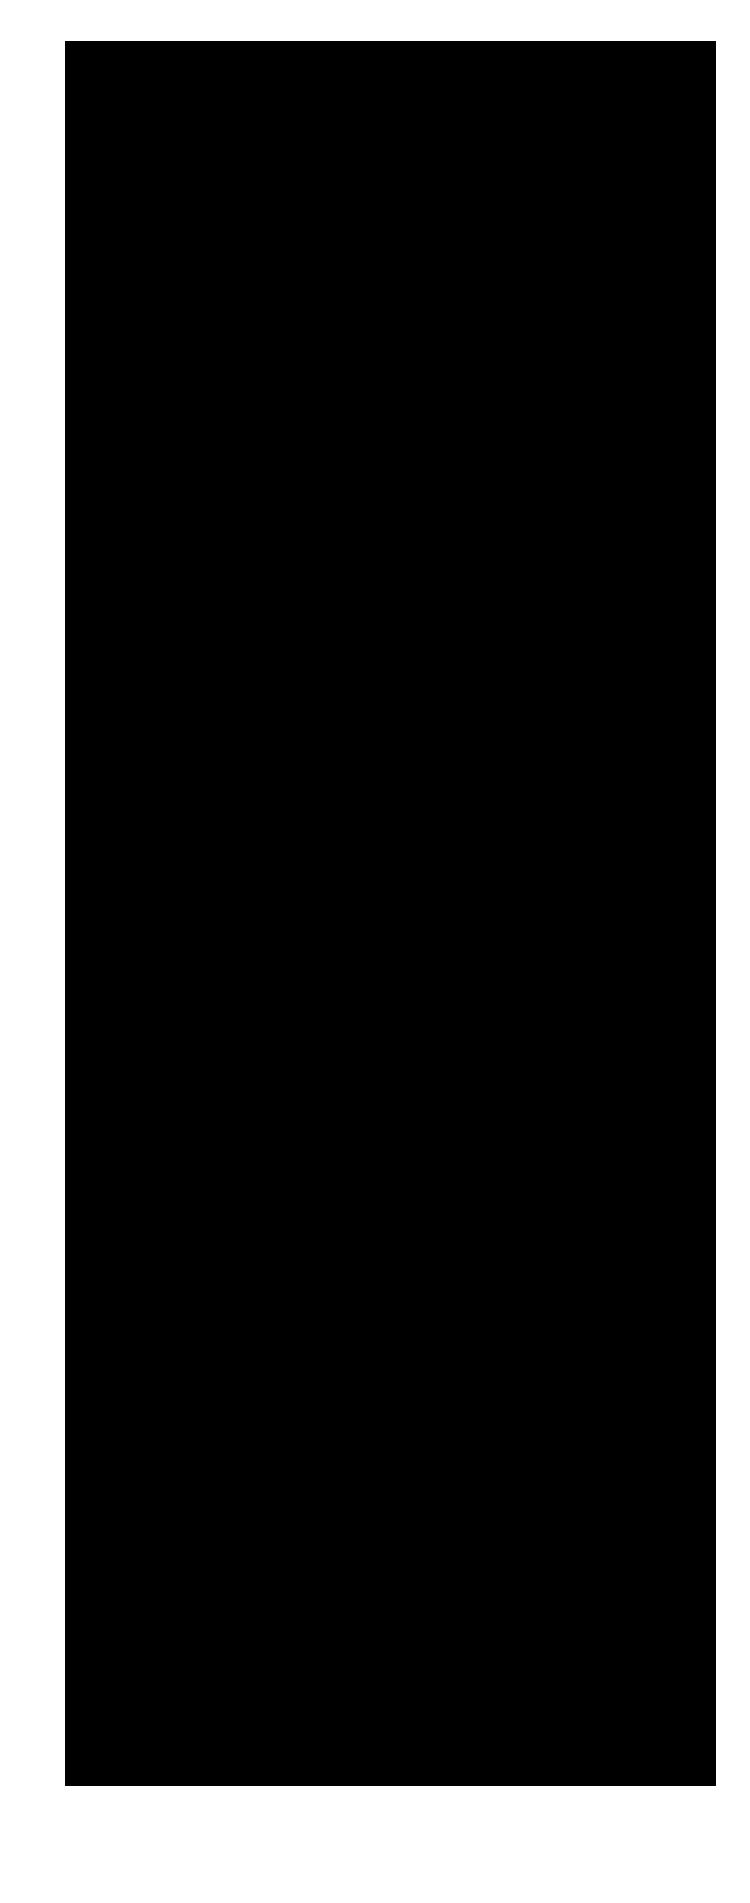 750x1903 Silhouettes Nonscandinavia